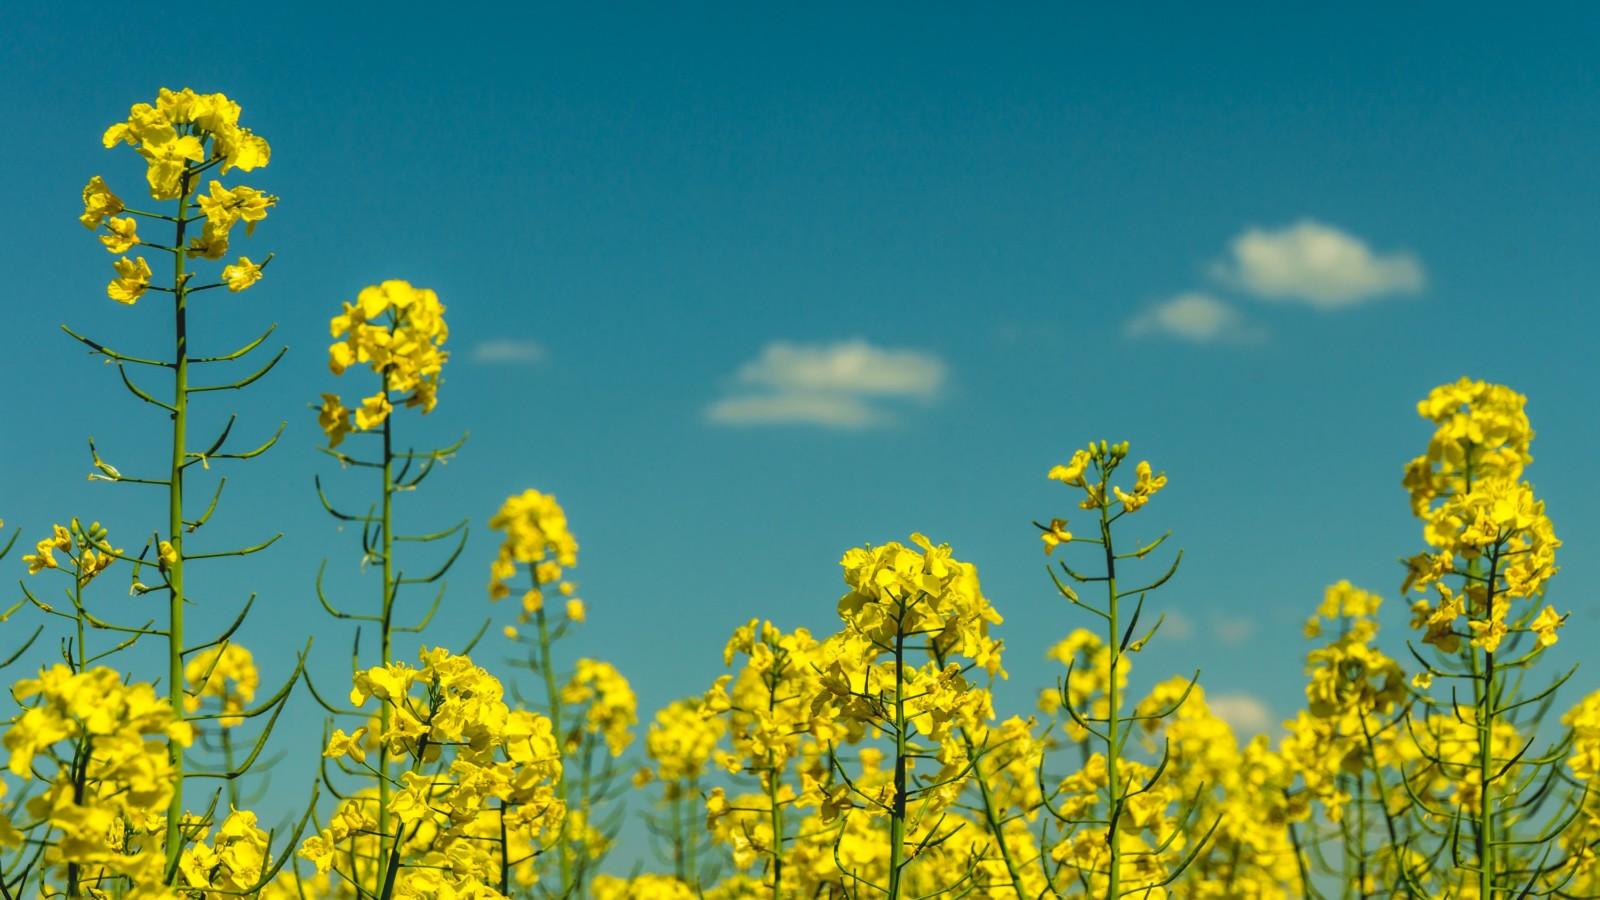 Food of the Future: Oilseed